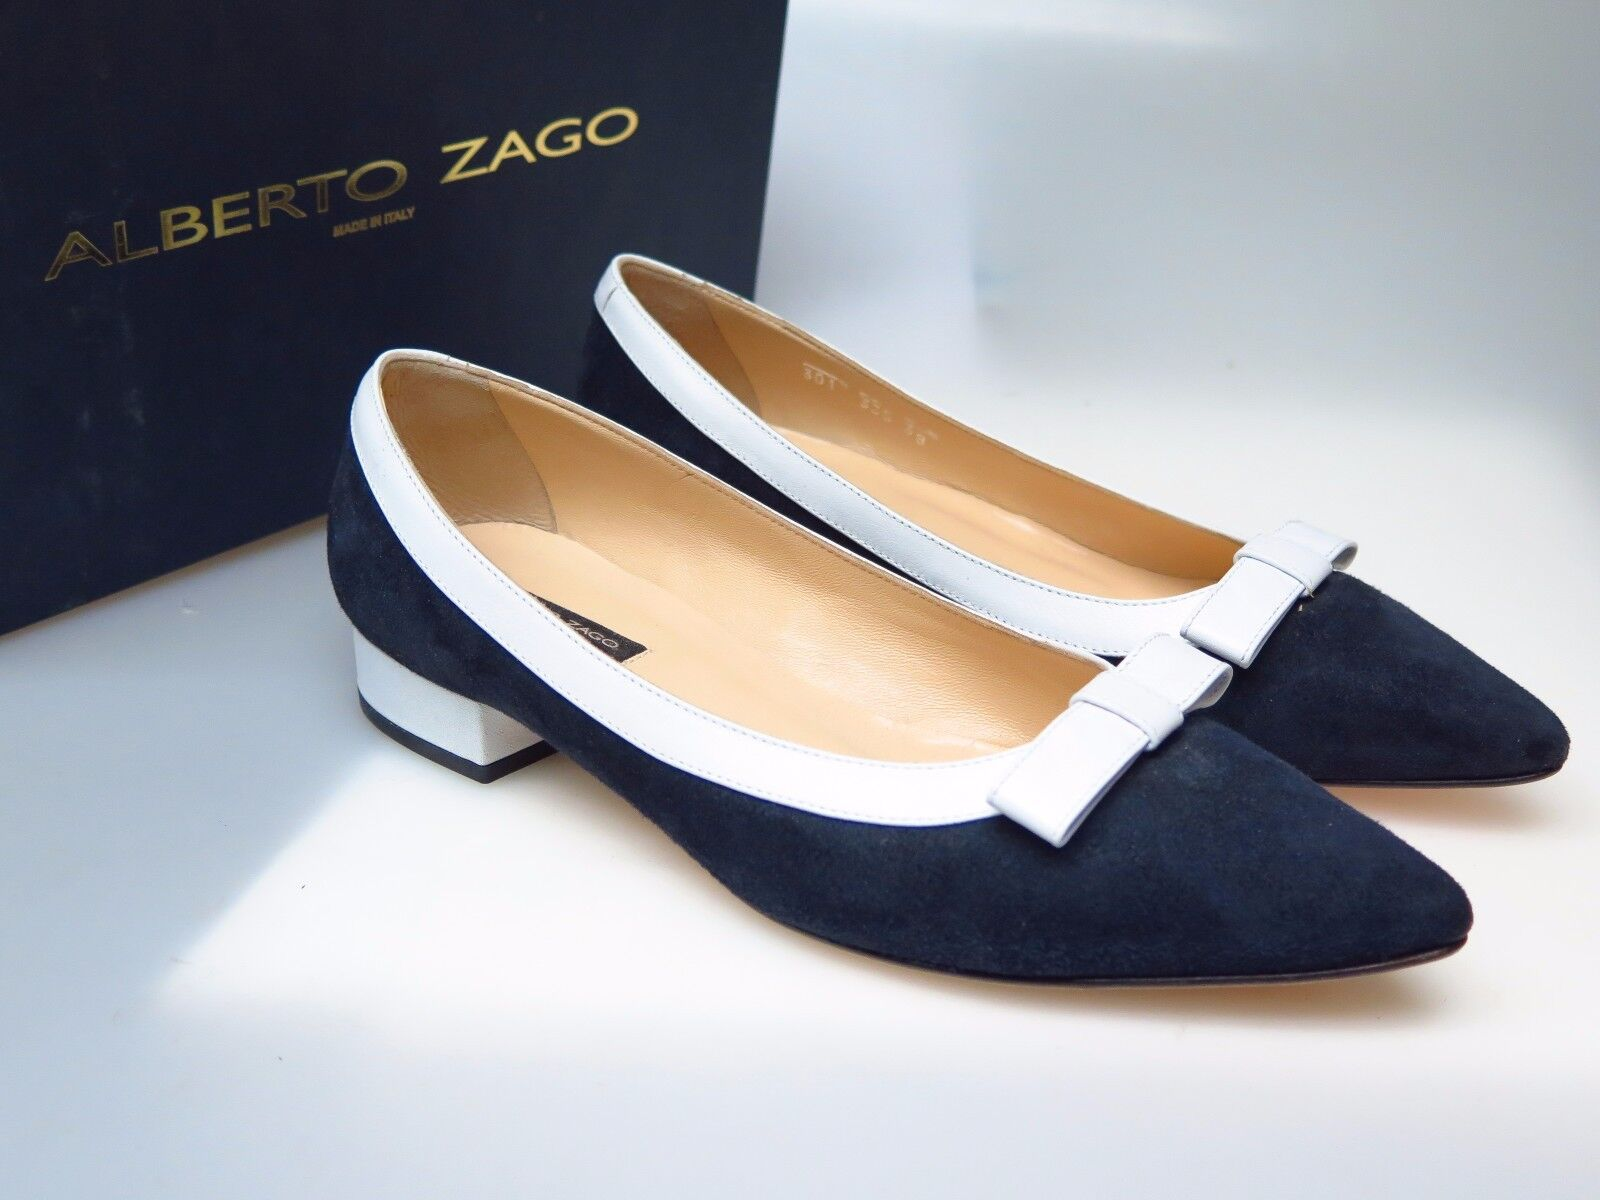 ALBERTO ZAGO Camoscio Damenschuhe Schuhe 301 Cardi Camoscio ZAGO Nappa Blau Gr. EU 38 NEU 465823